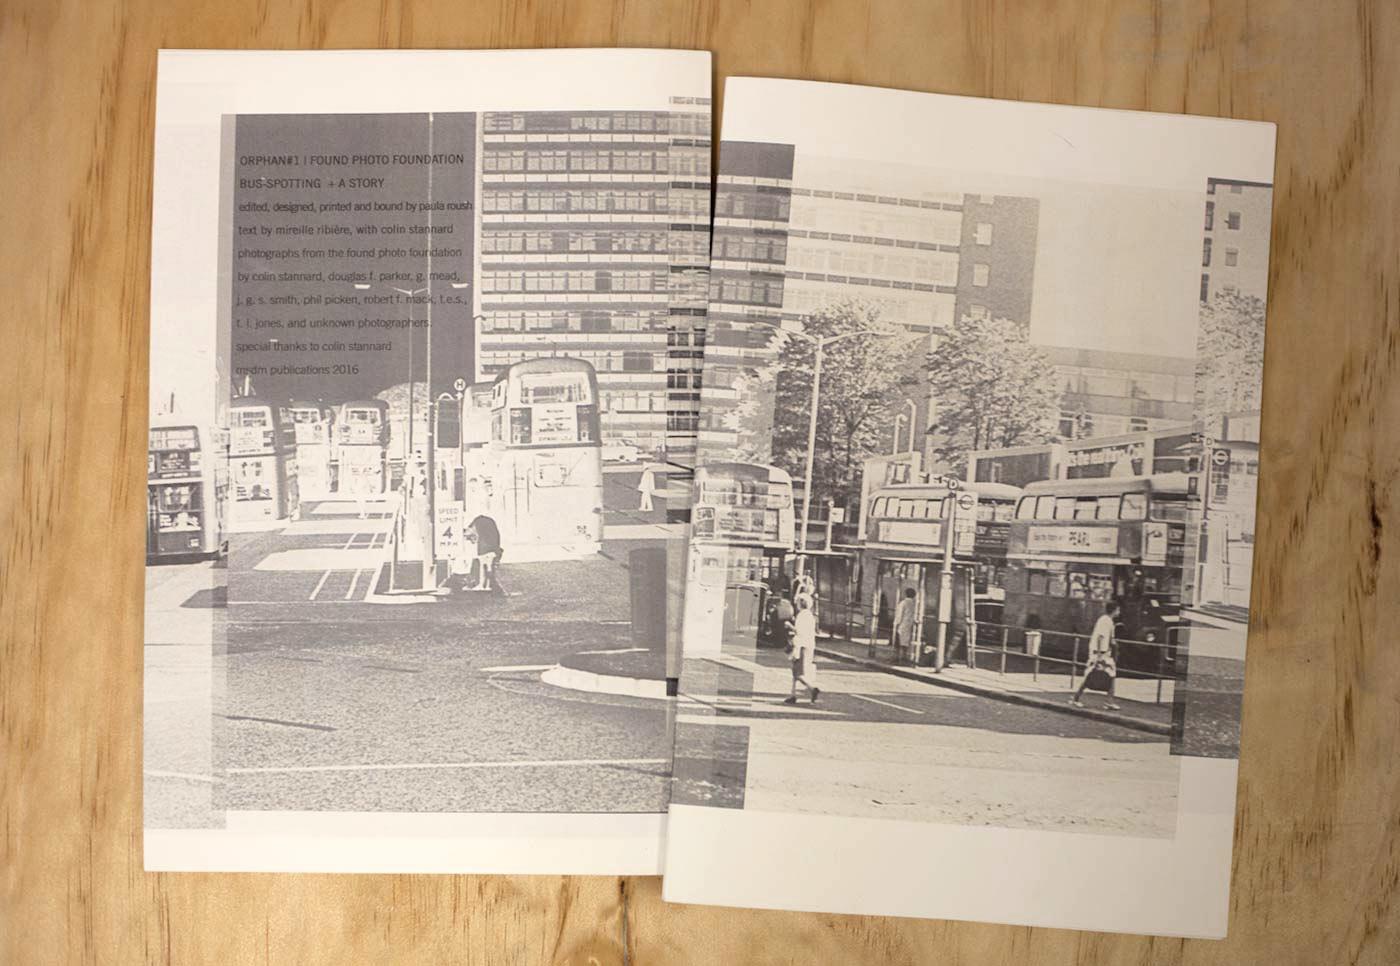 paula-roush-bus-spotting-photobook-msdm-publications-orphan1-148